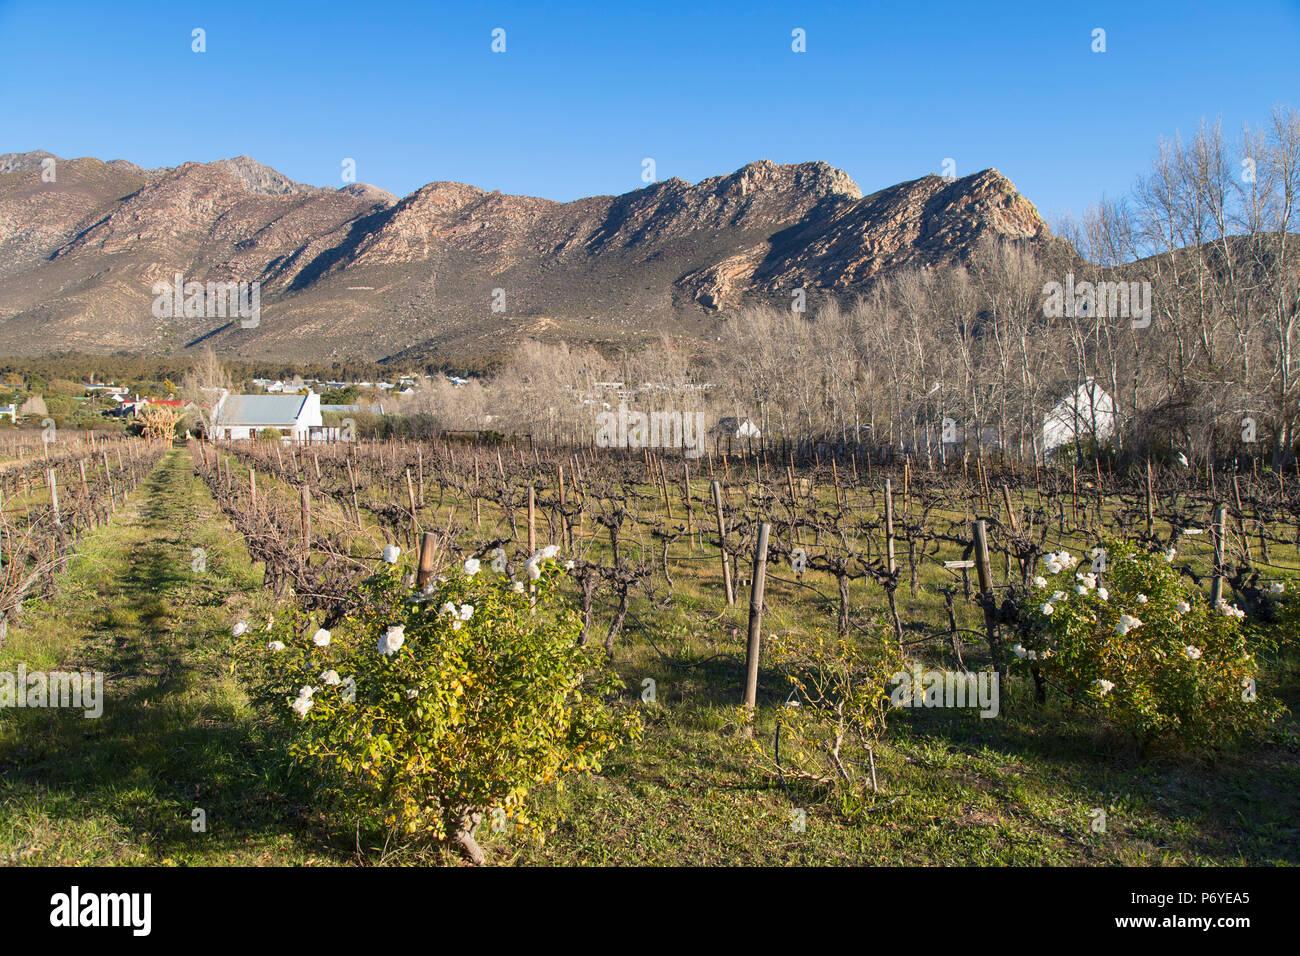 Vineyard, Montagu, Western Cape, South Africa - Stock Image